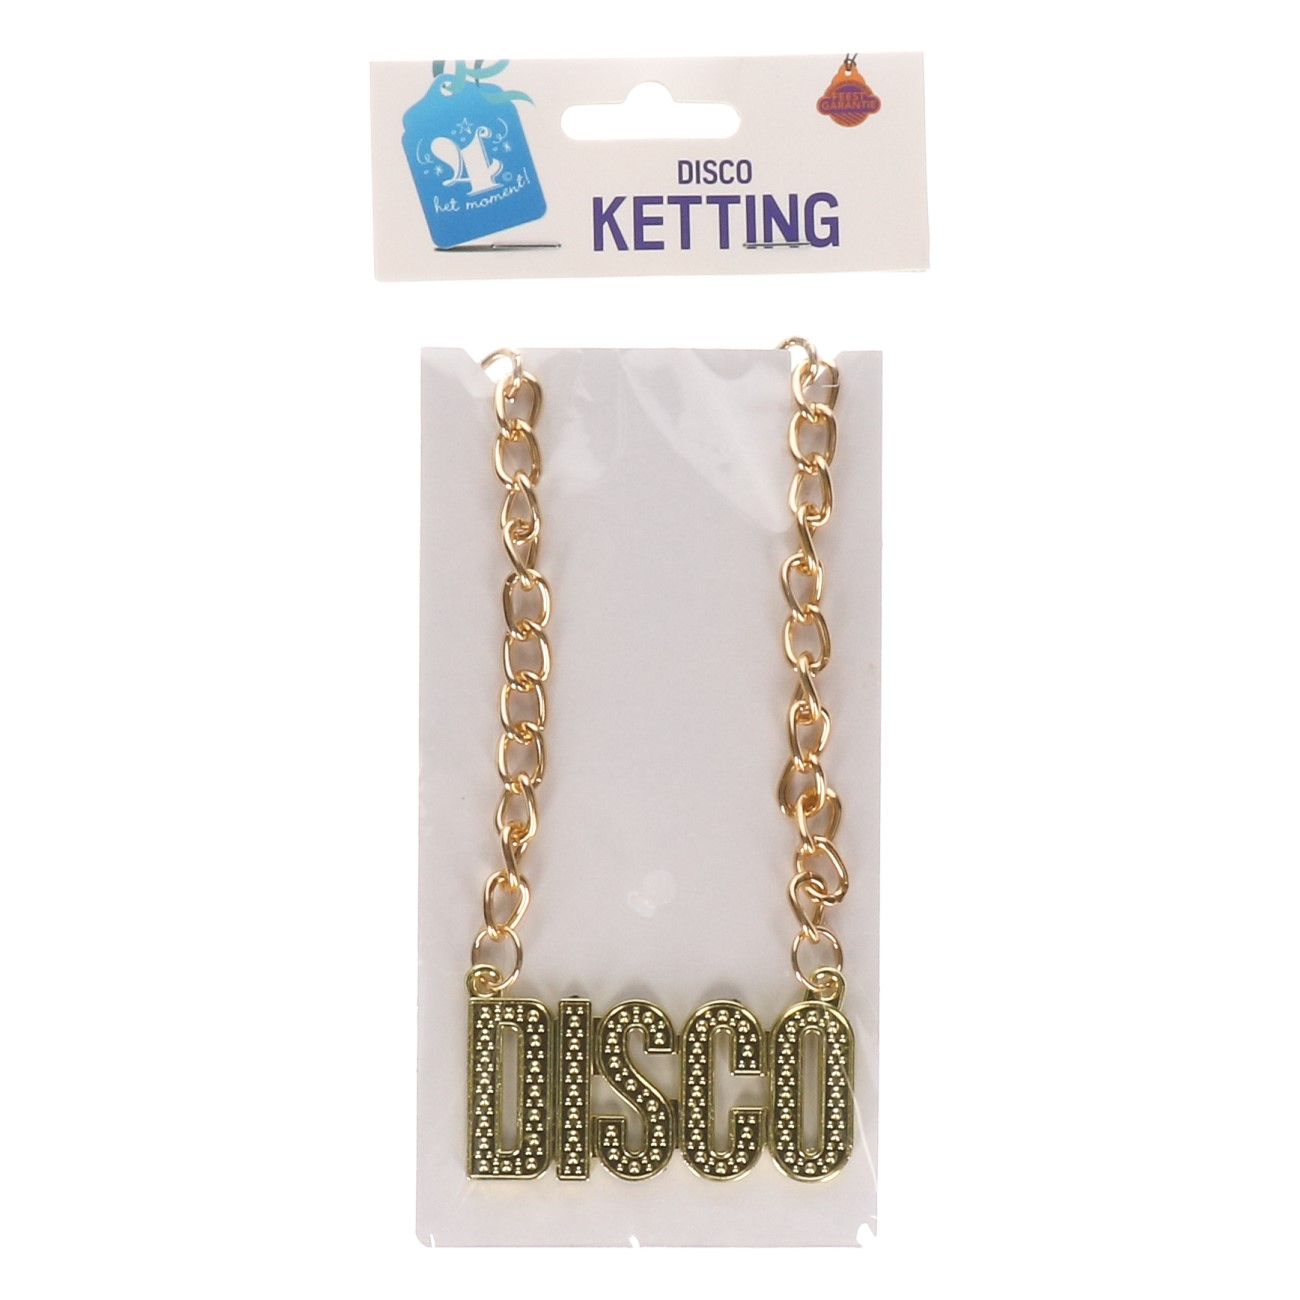 Ketting disco #876